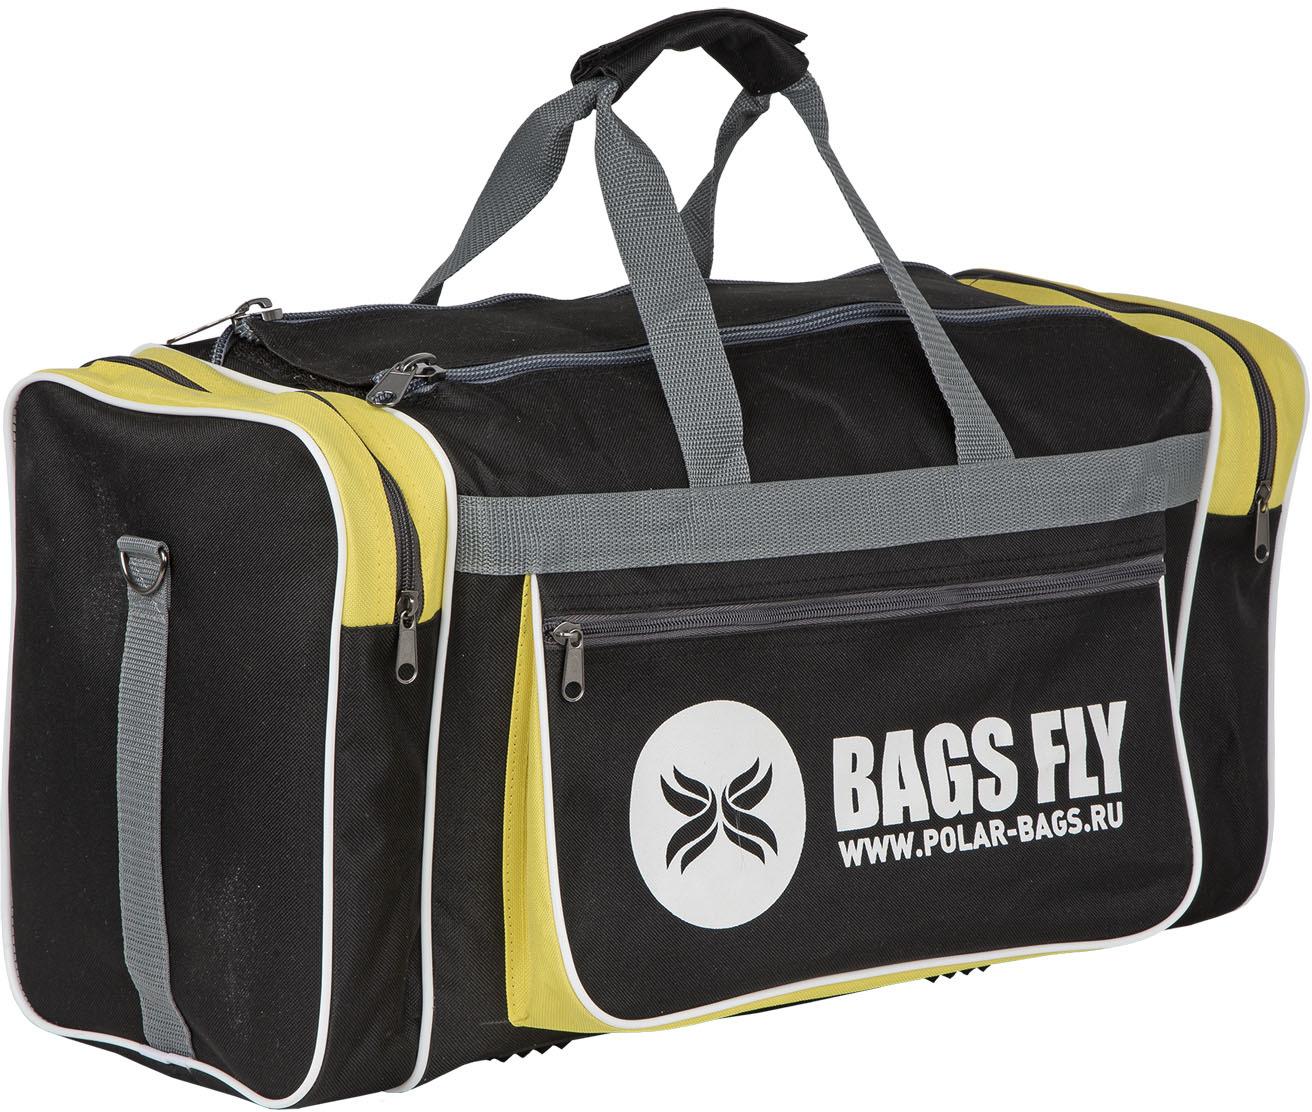 Сумка спортивная Polar, цвет: черный, желтый, серый, 30,5 л рюкзак polar polar po001burvn31